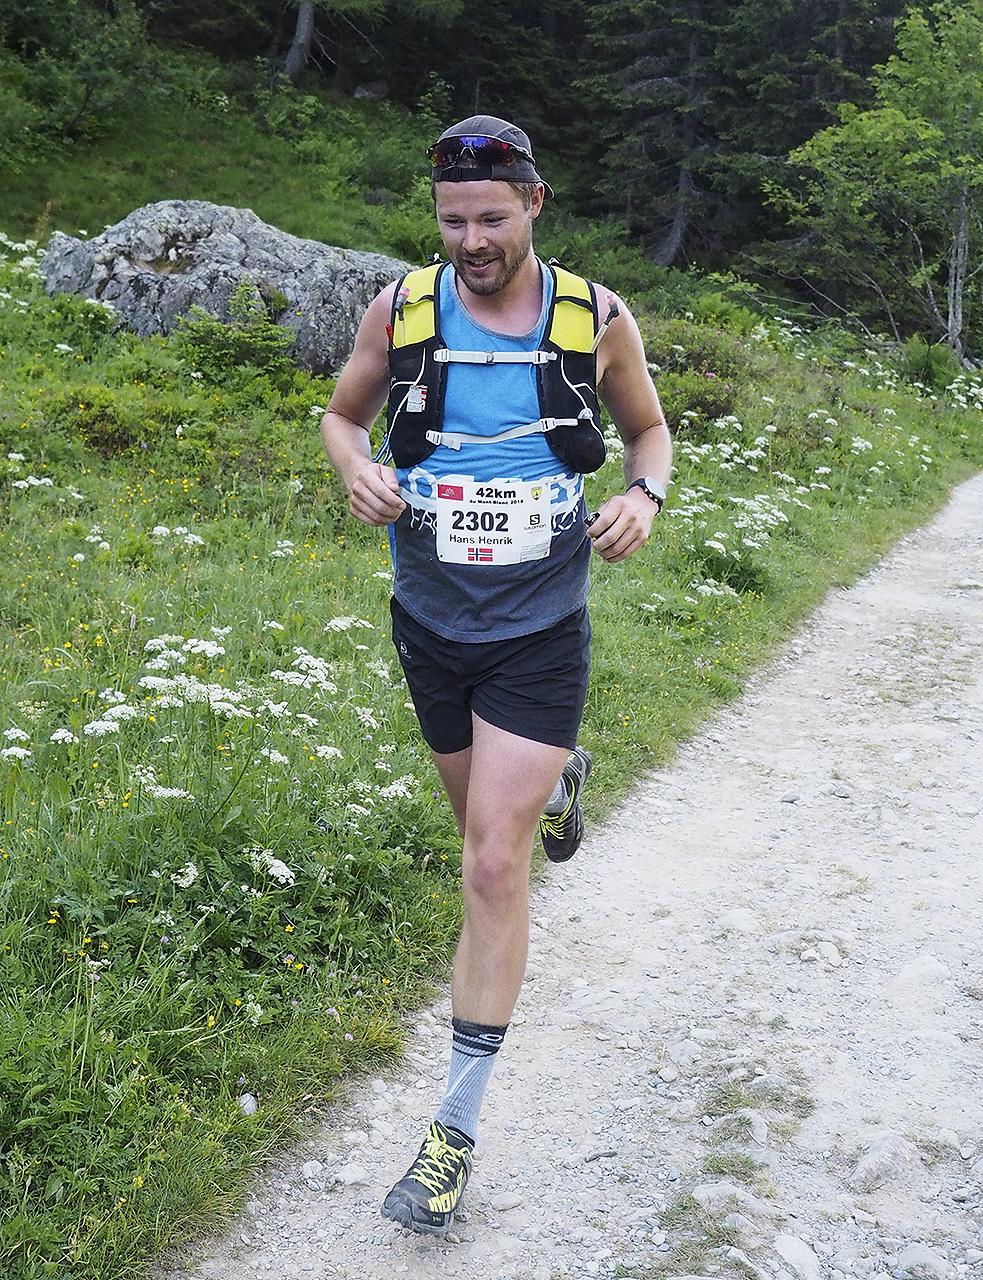 Hans-Henrik-Holmerud_7011876.jpg